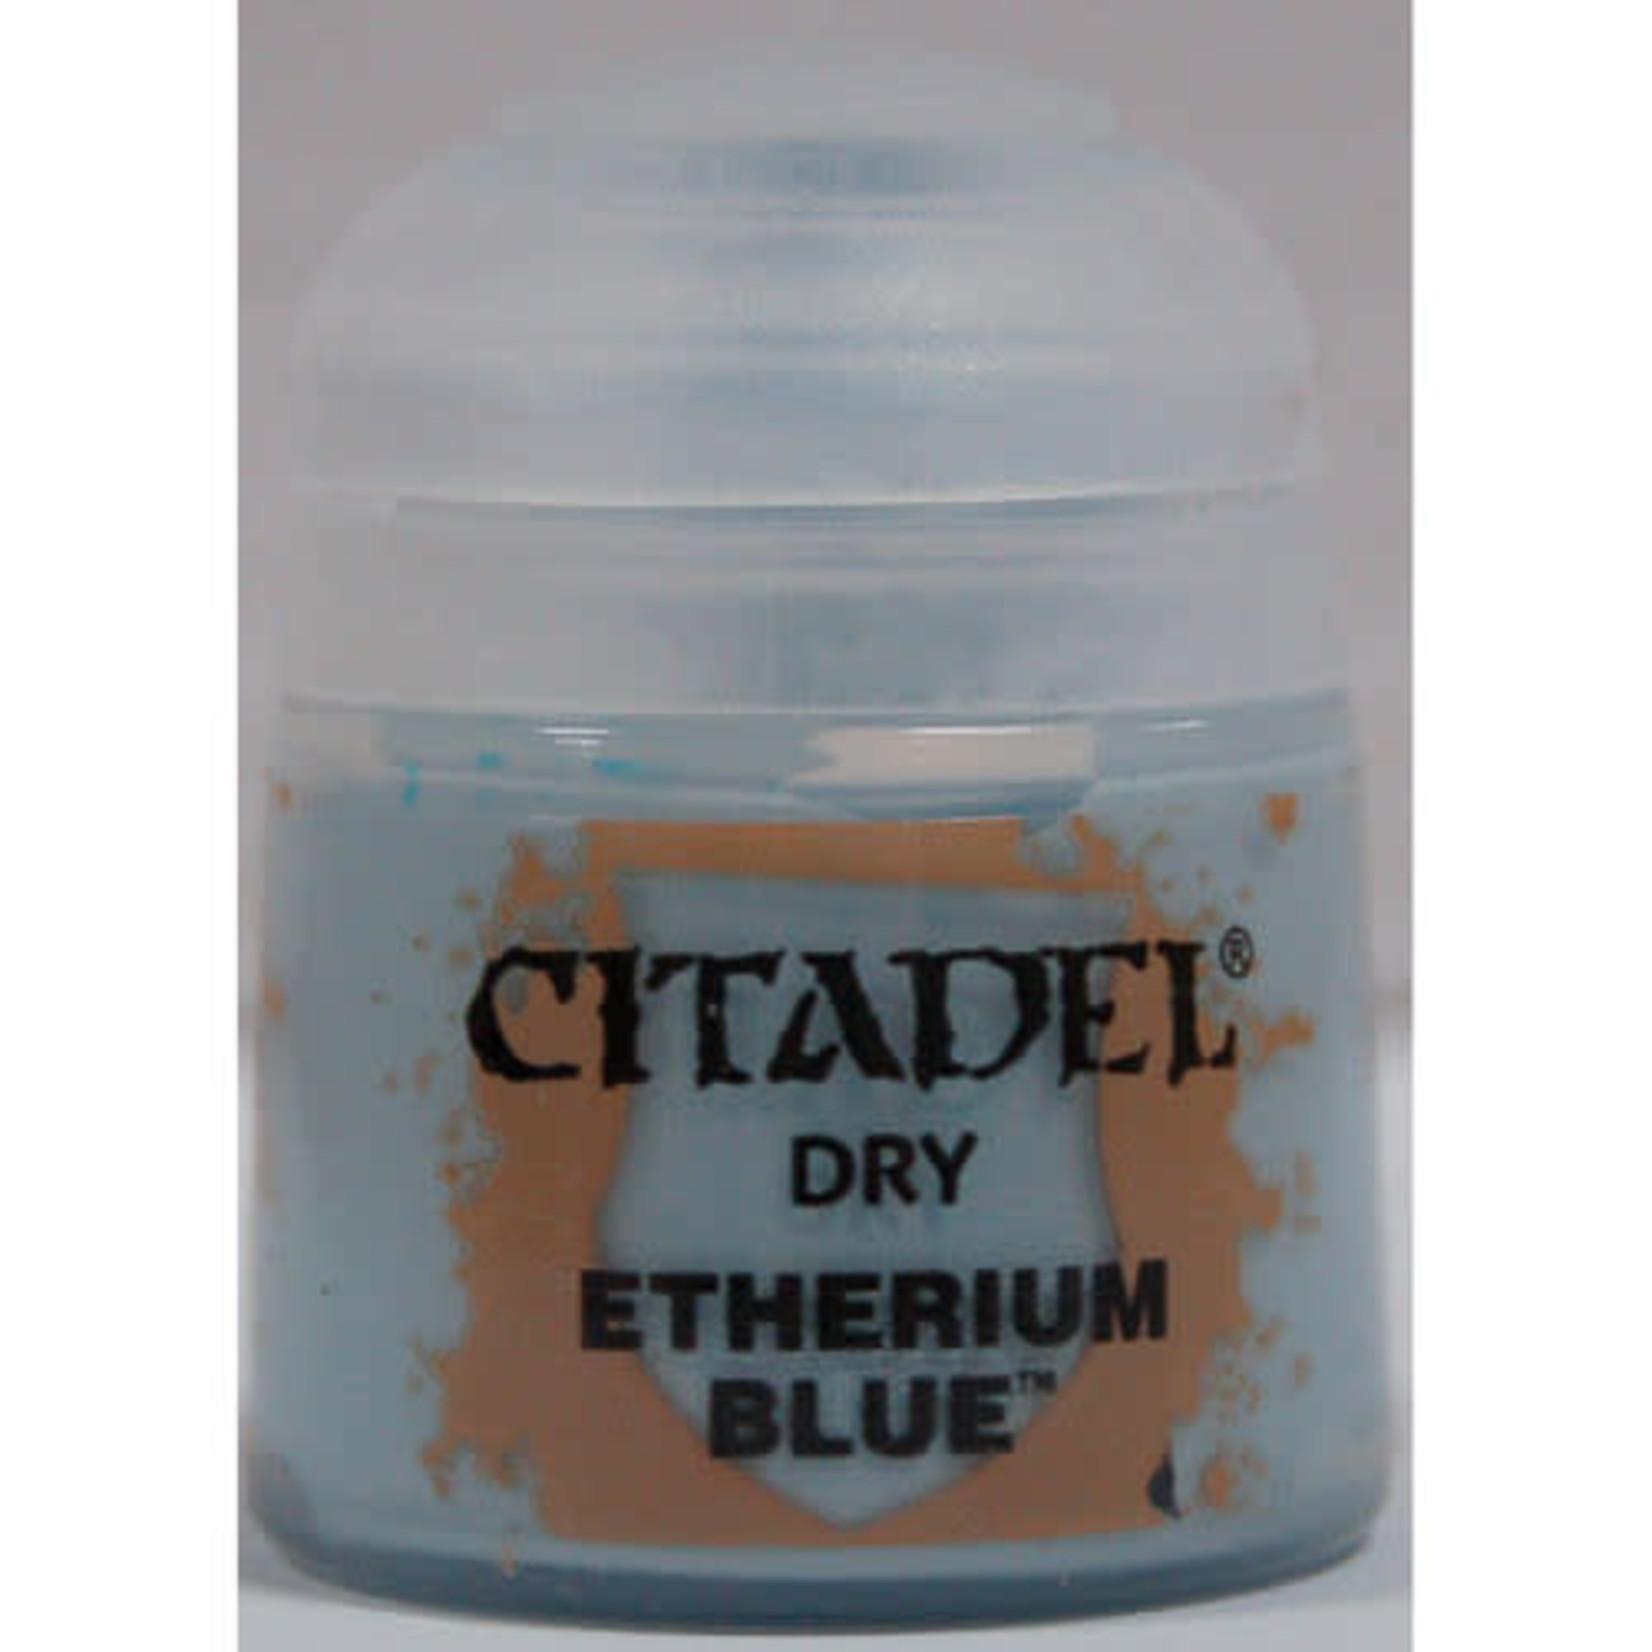 Citadel Citadel Paint - Dry: Etherium Blue